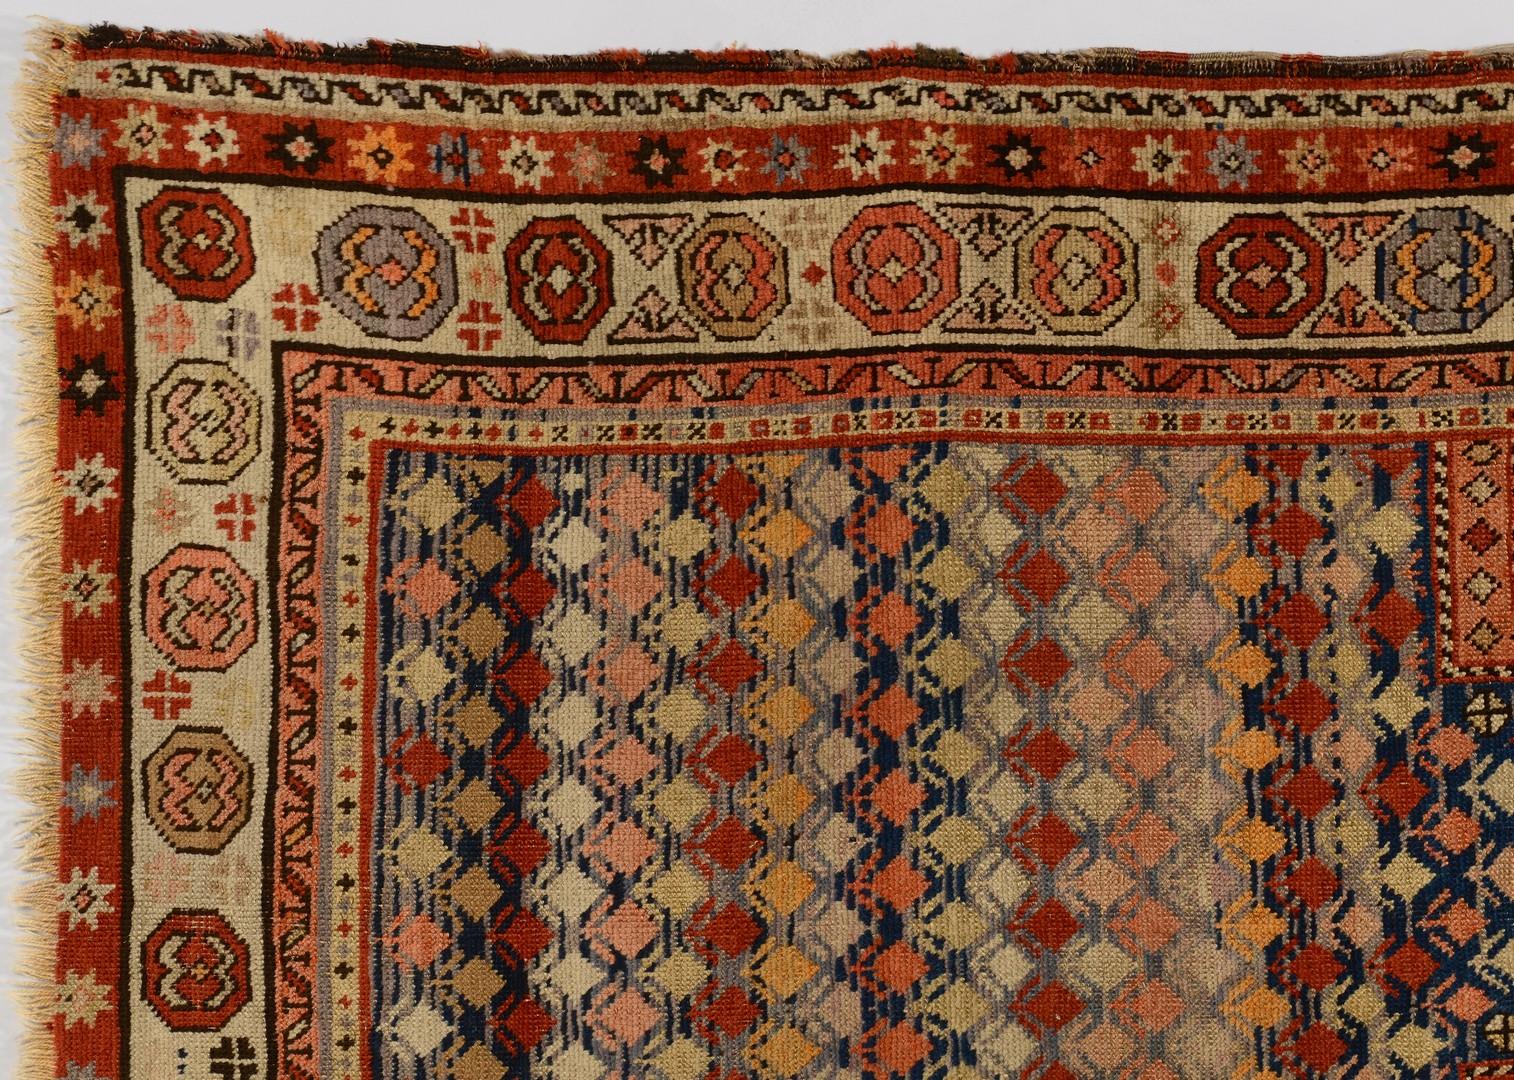 Lot 843: Caucasian Prayer Rug